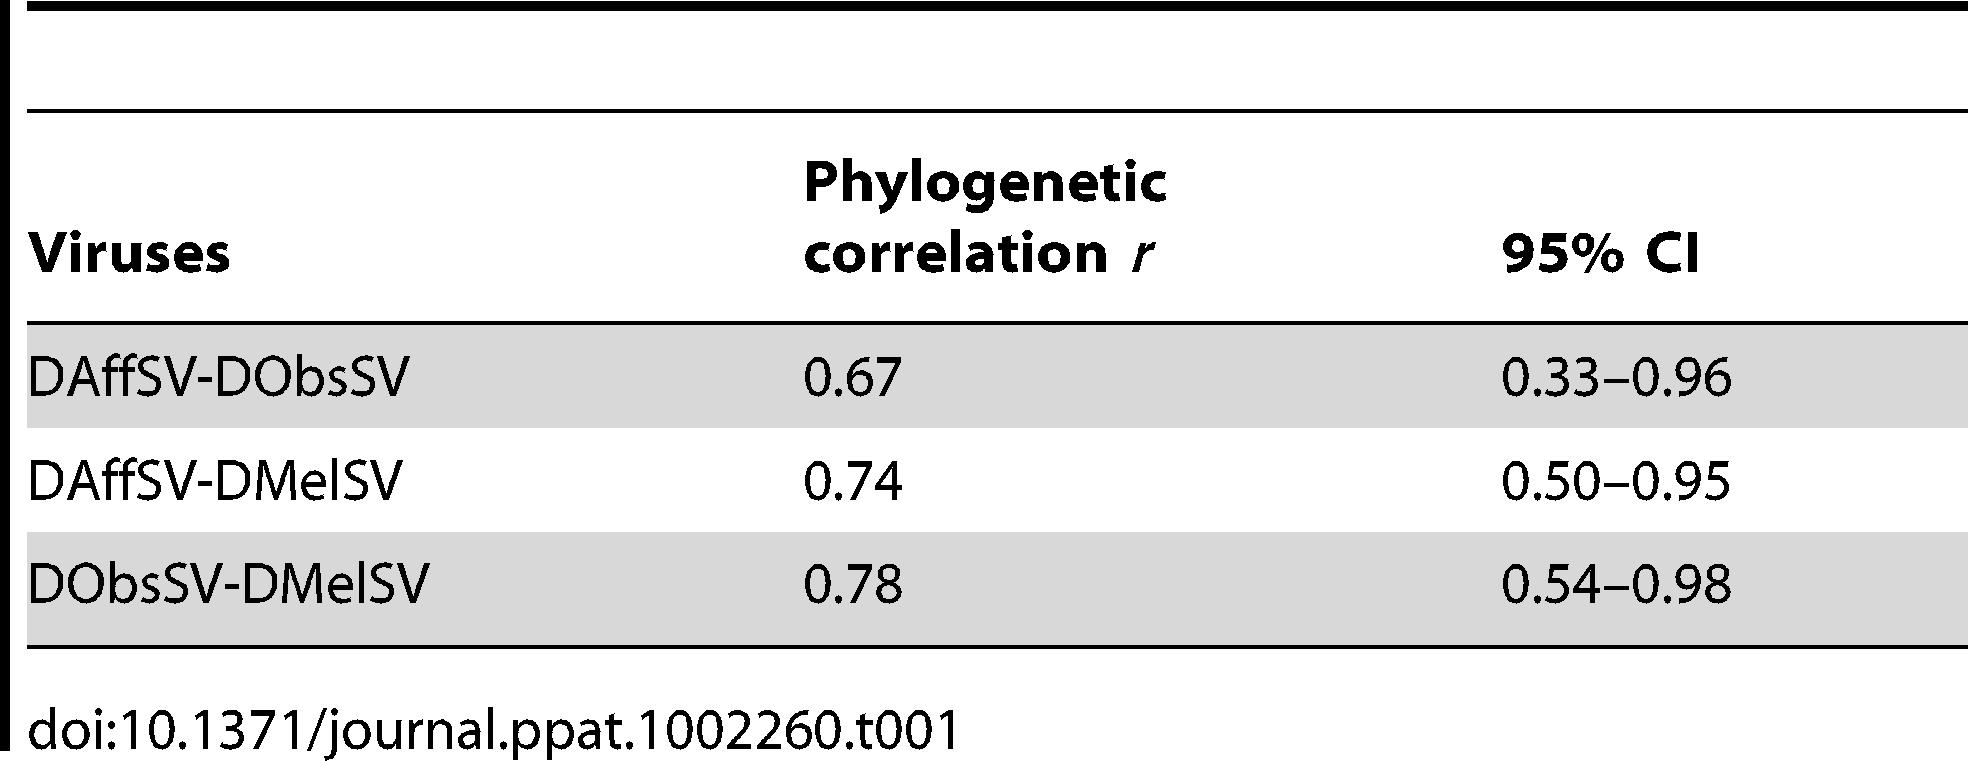 Phylogenetic correlations and 95% CI between each pair of viruses.